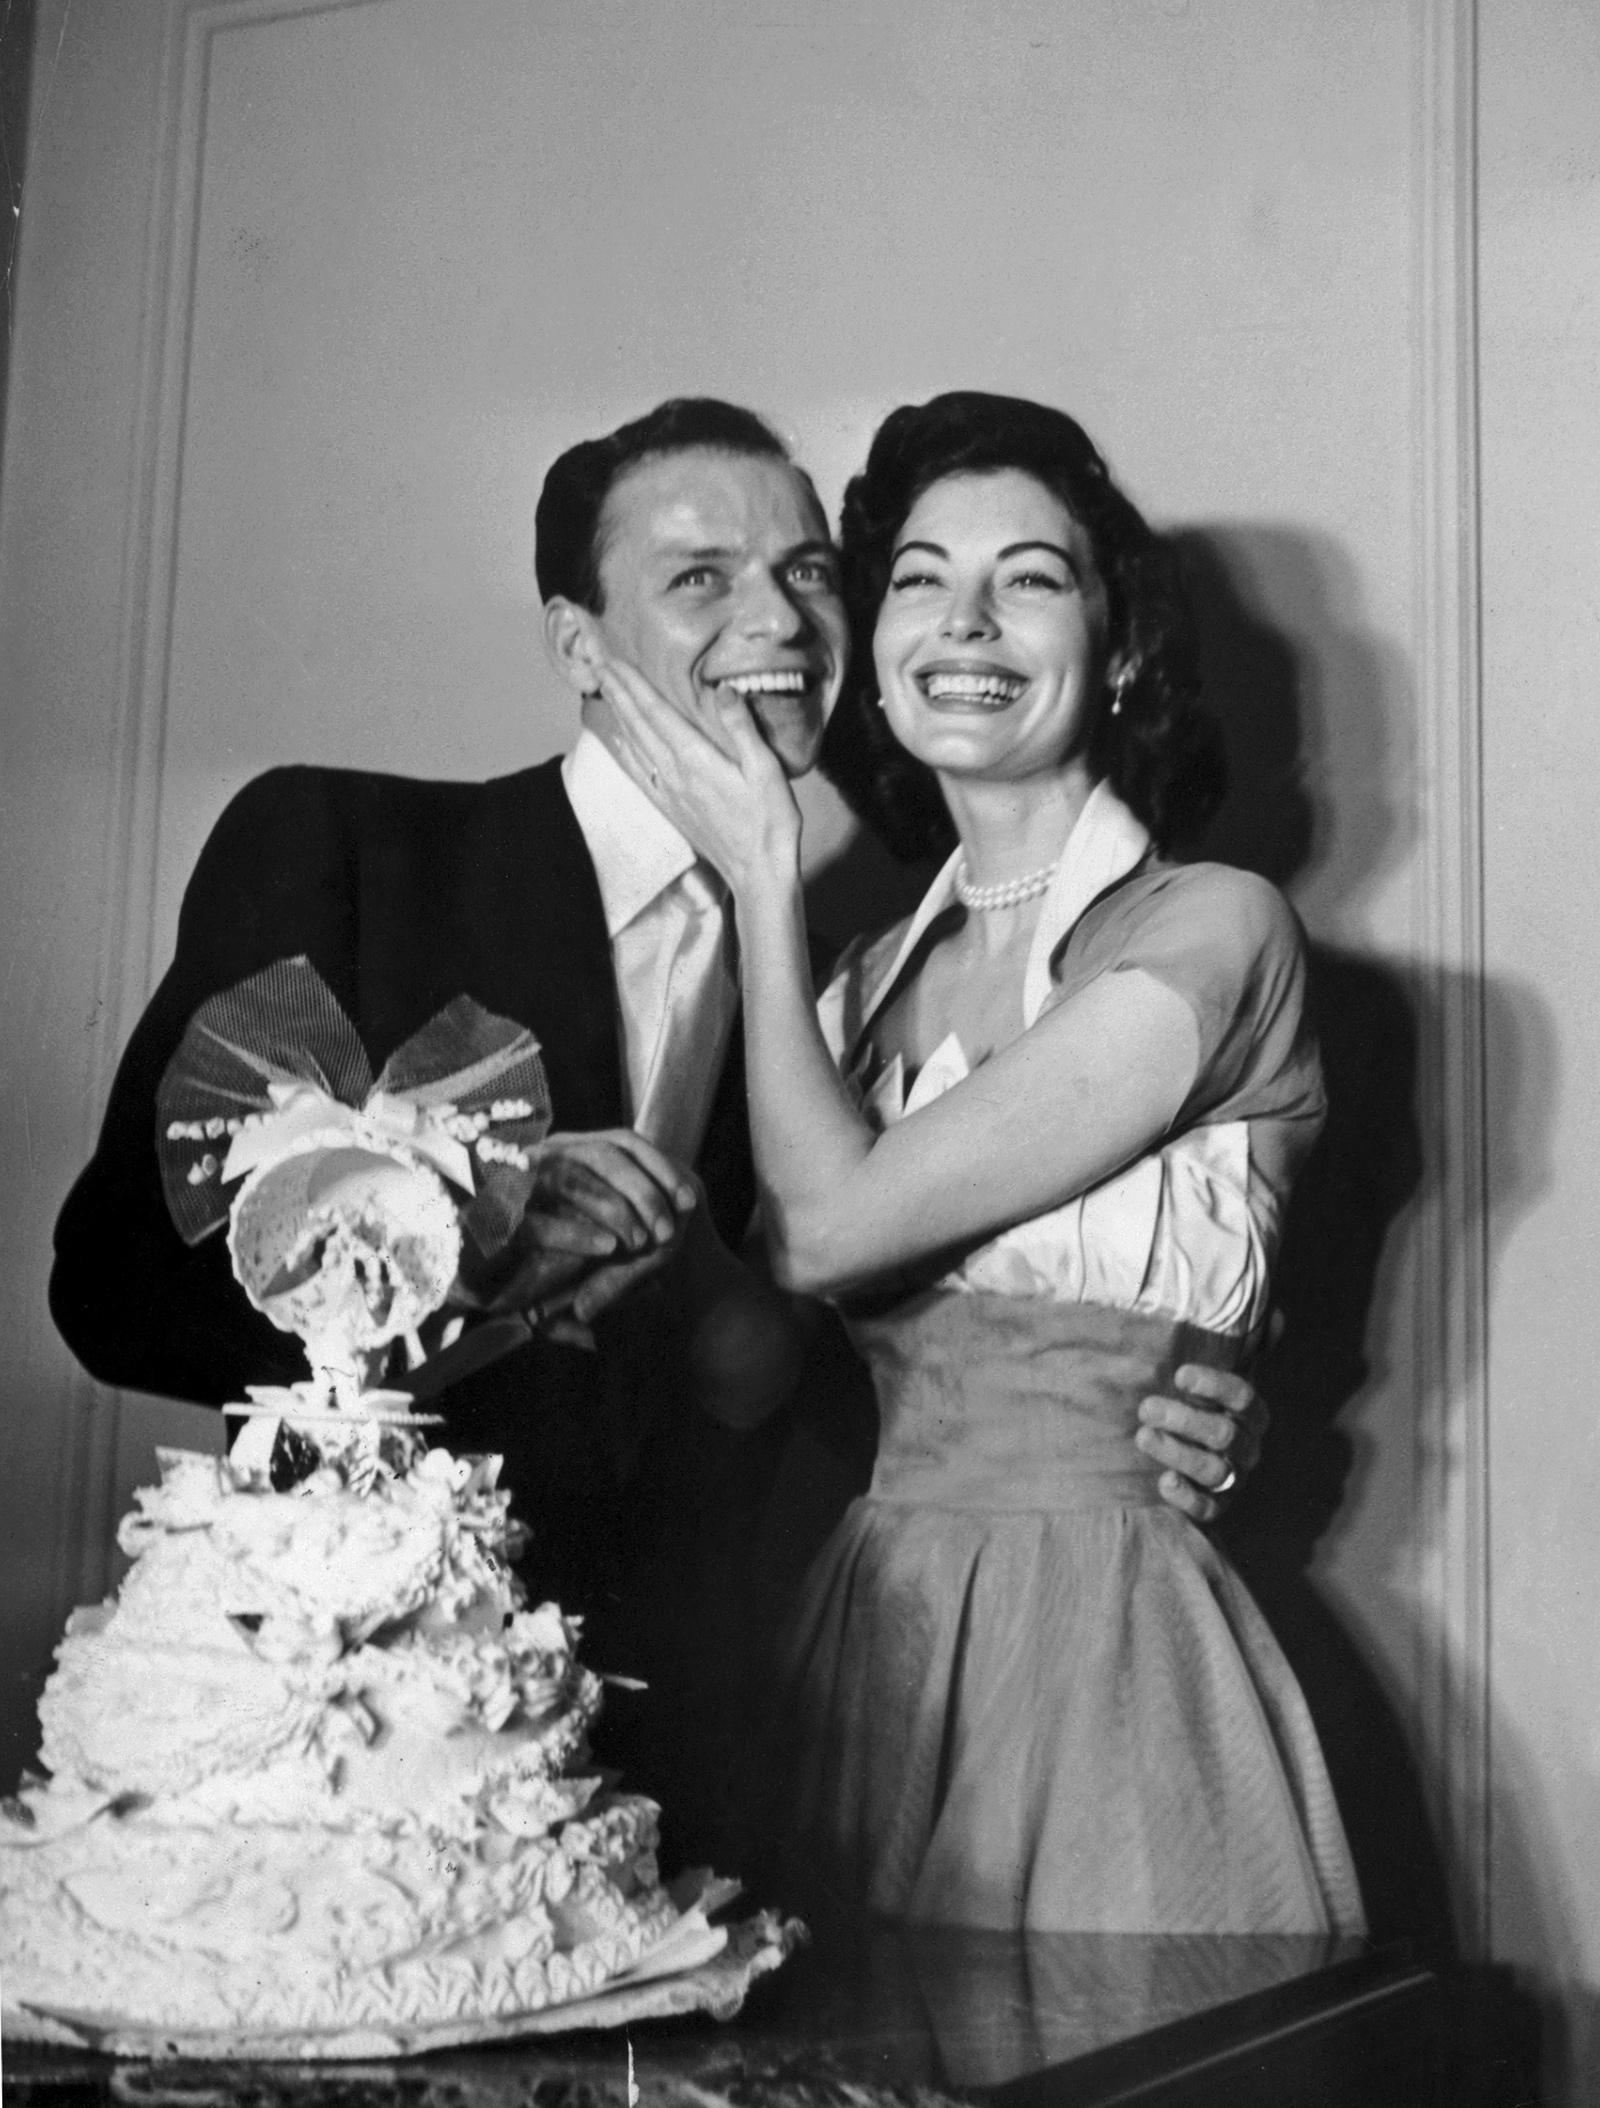 Frank Sinatra and Ava Gardner on their wedding day, Philadelphia, November 7, 1951